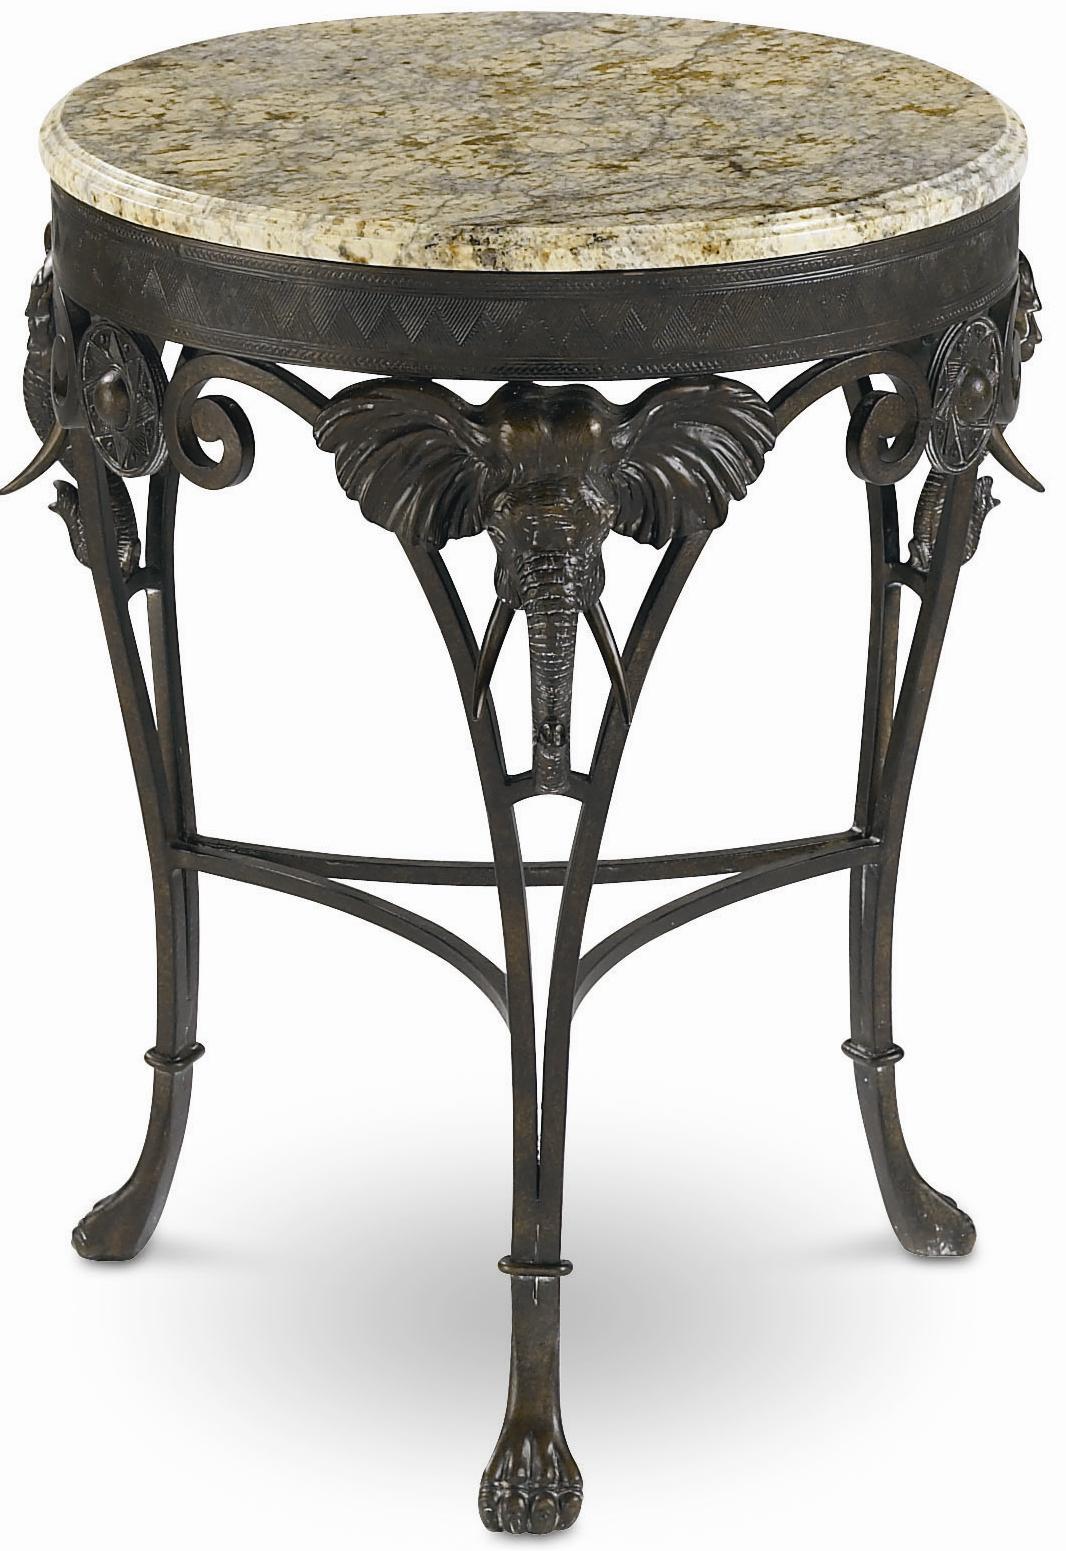 Thomasville® Ernest Hemingway Elephant Accent Table ...